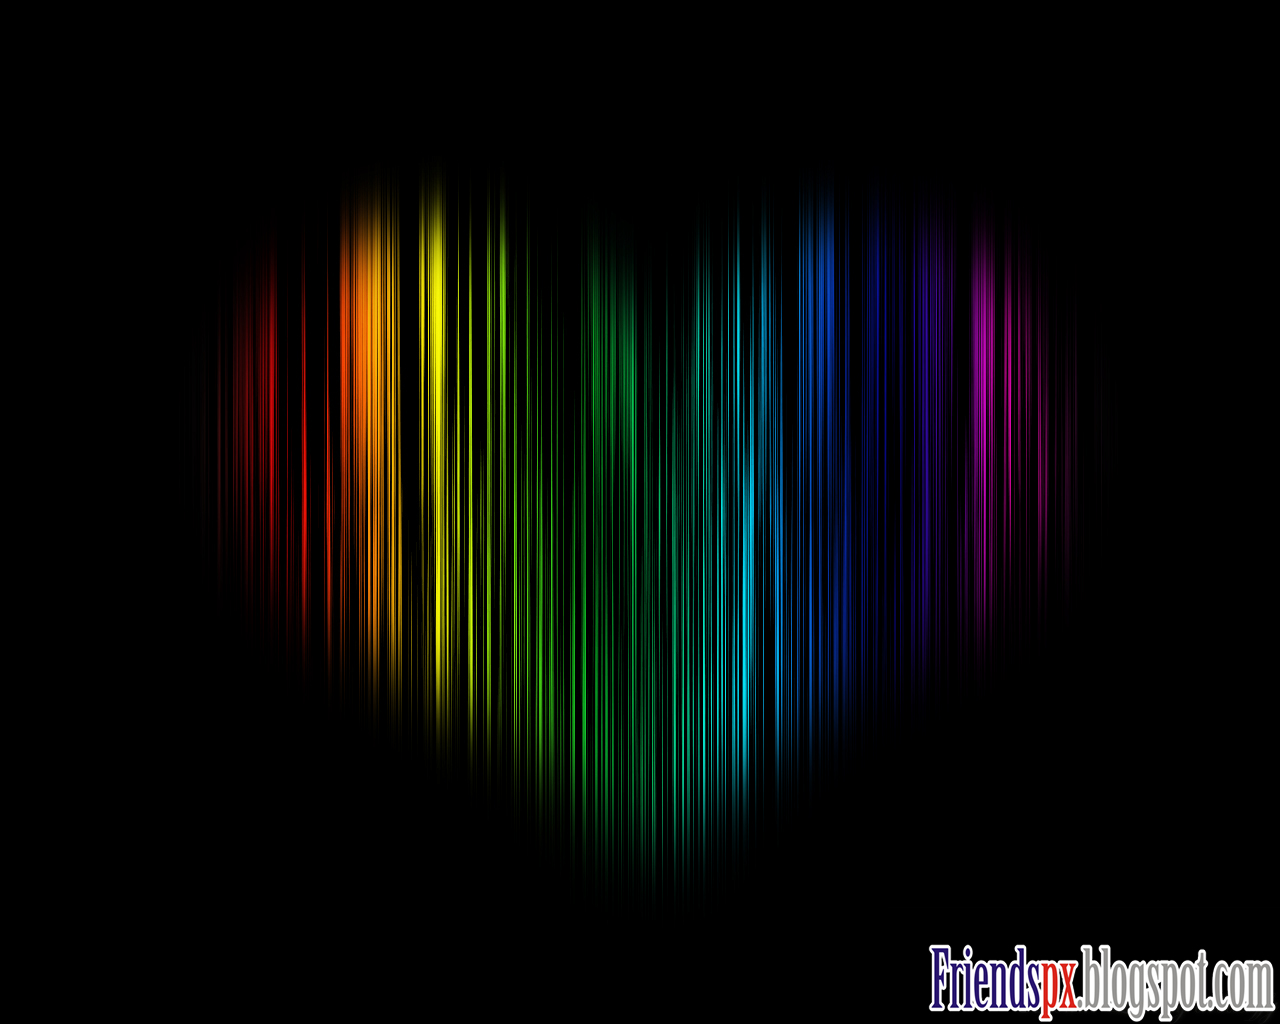 Friendspx: Atomic Colorful Love